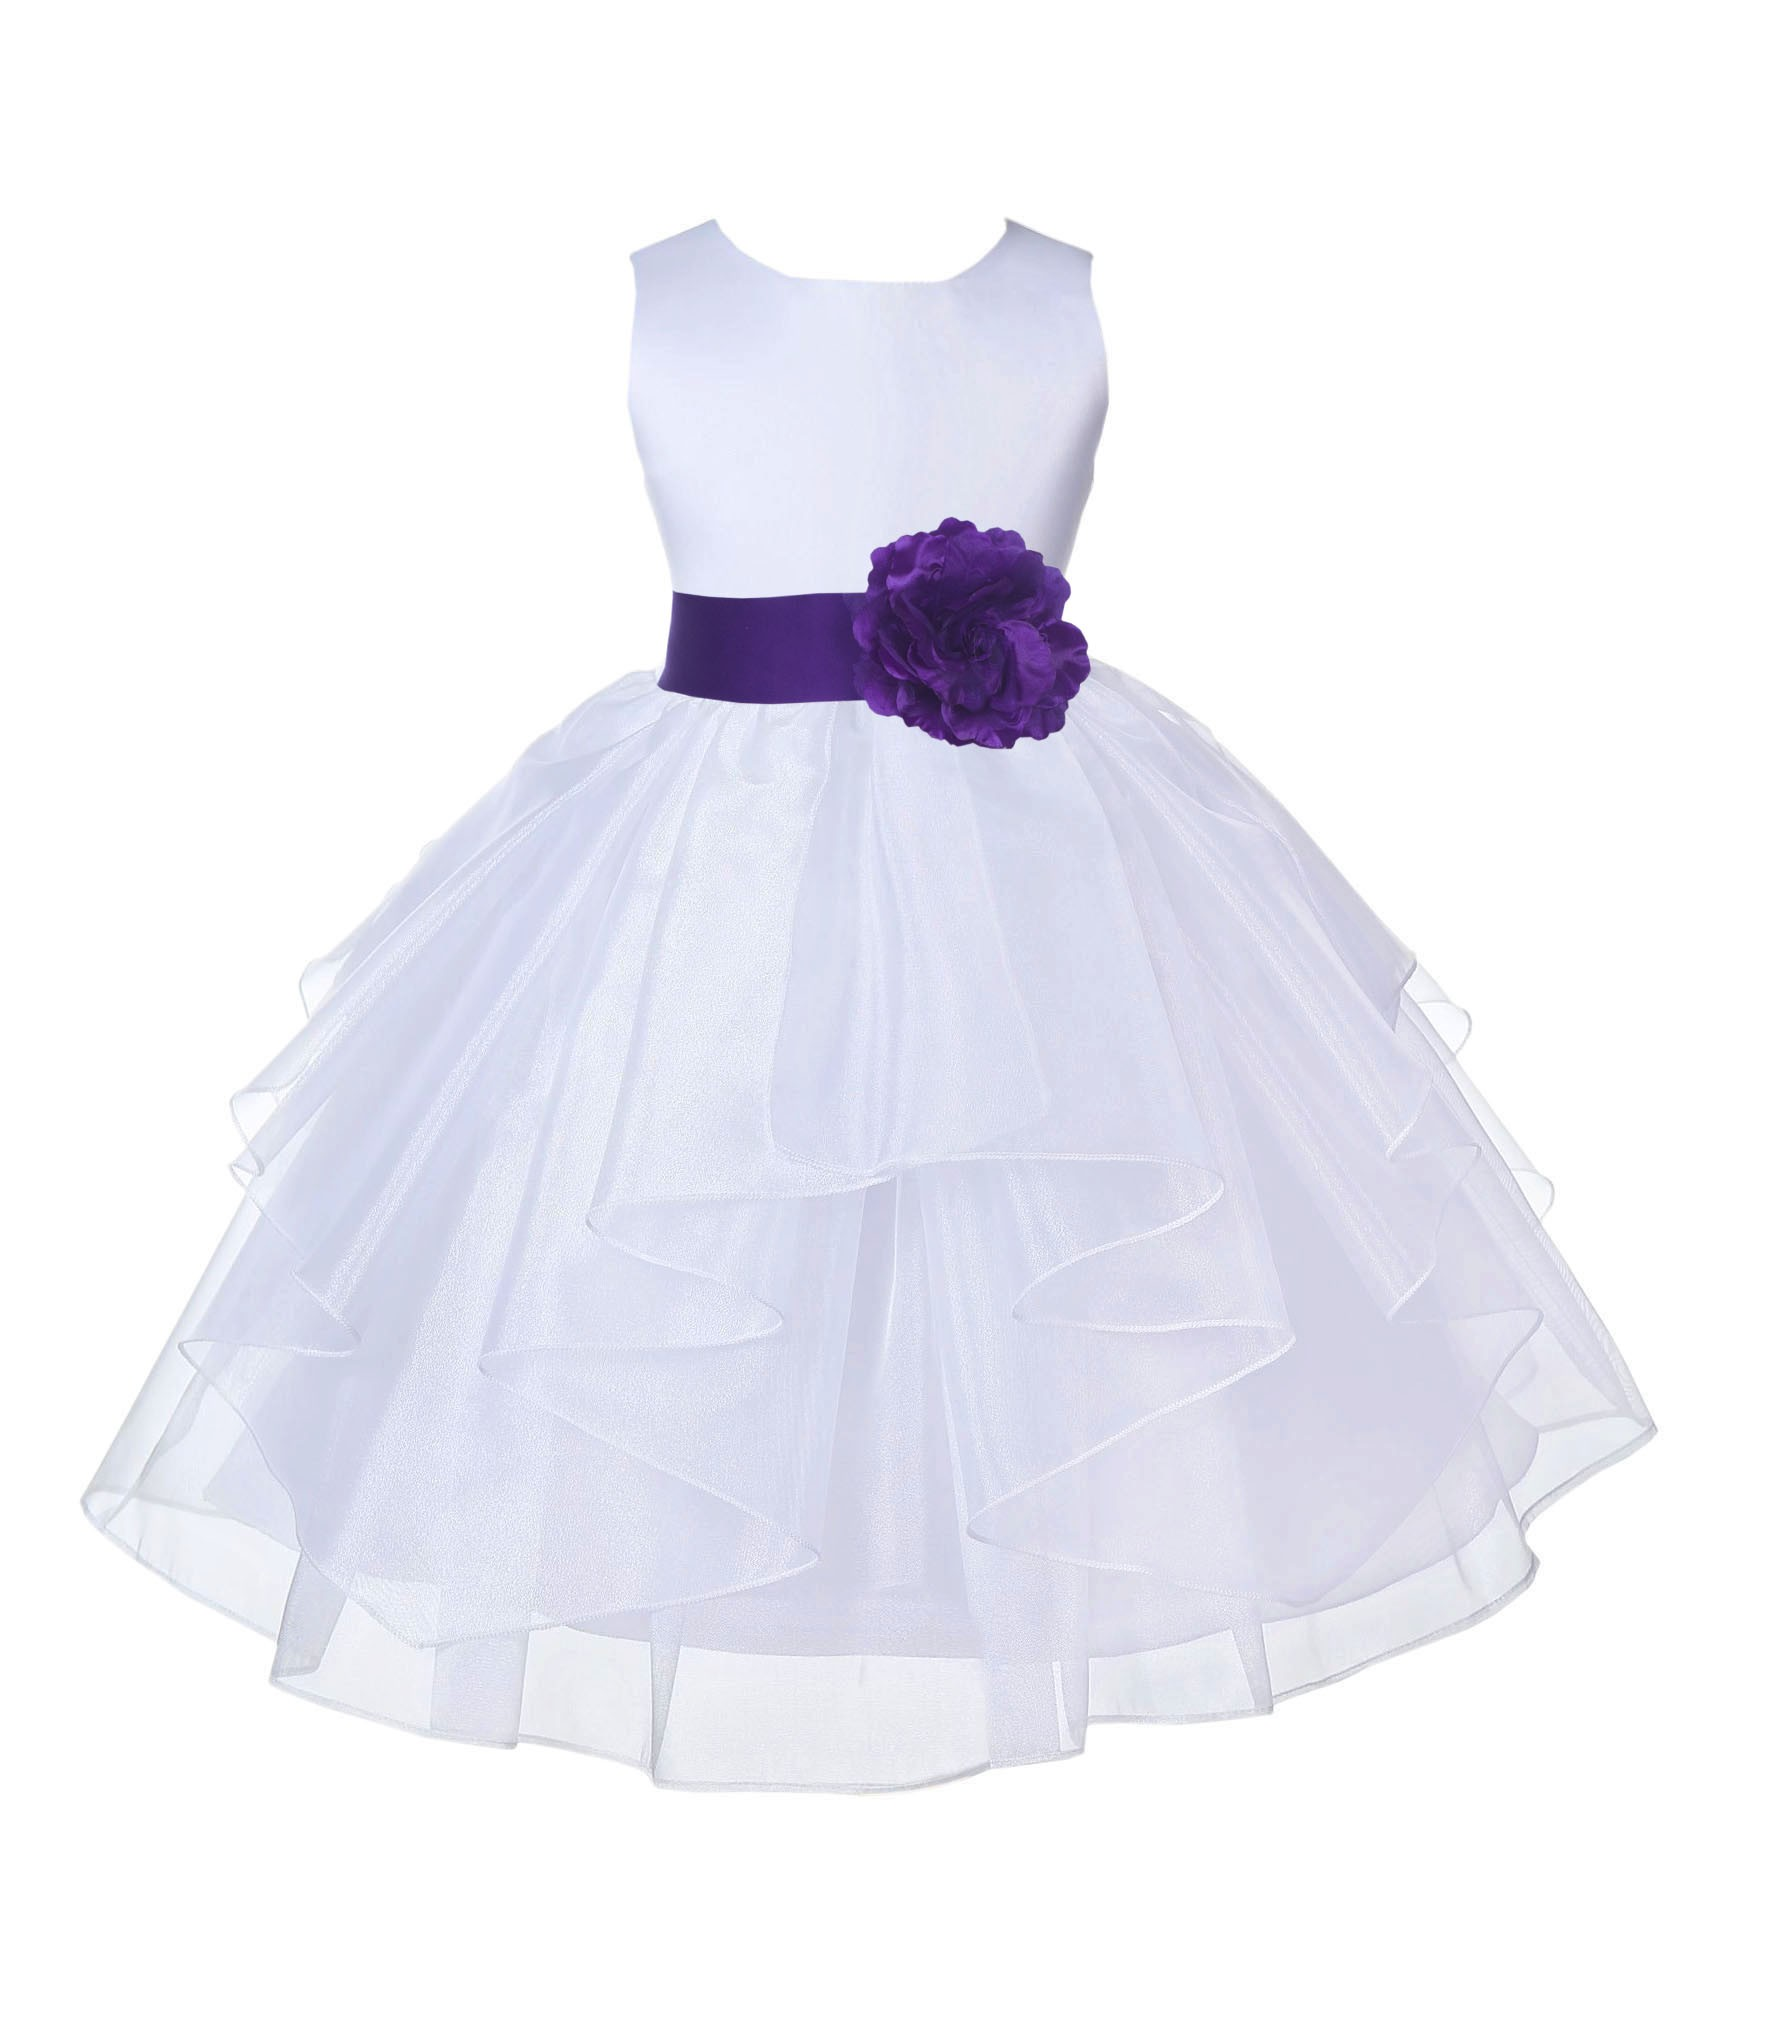 White/Cadbury Satin Shimmering Organza Flower Girl Dress Wedding 4613S